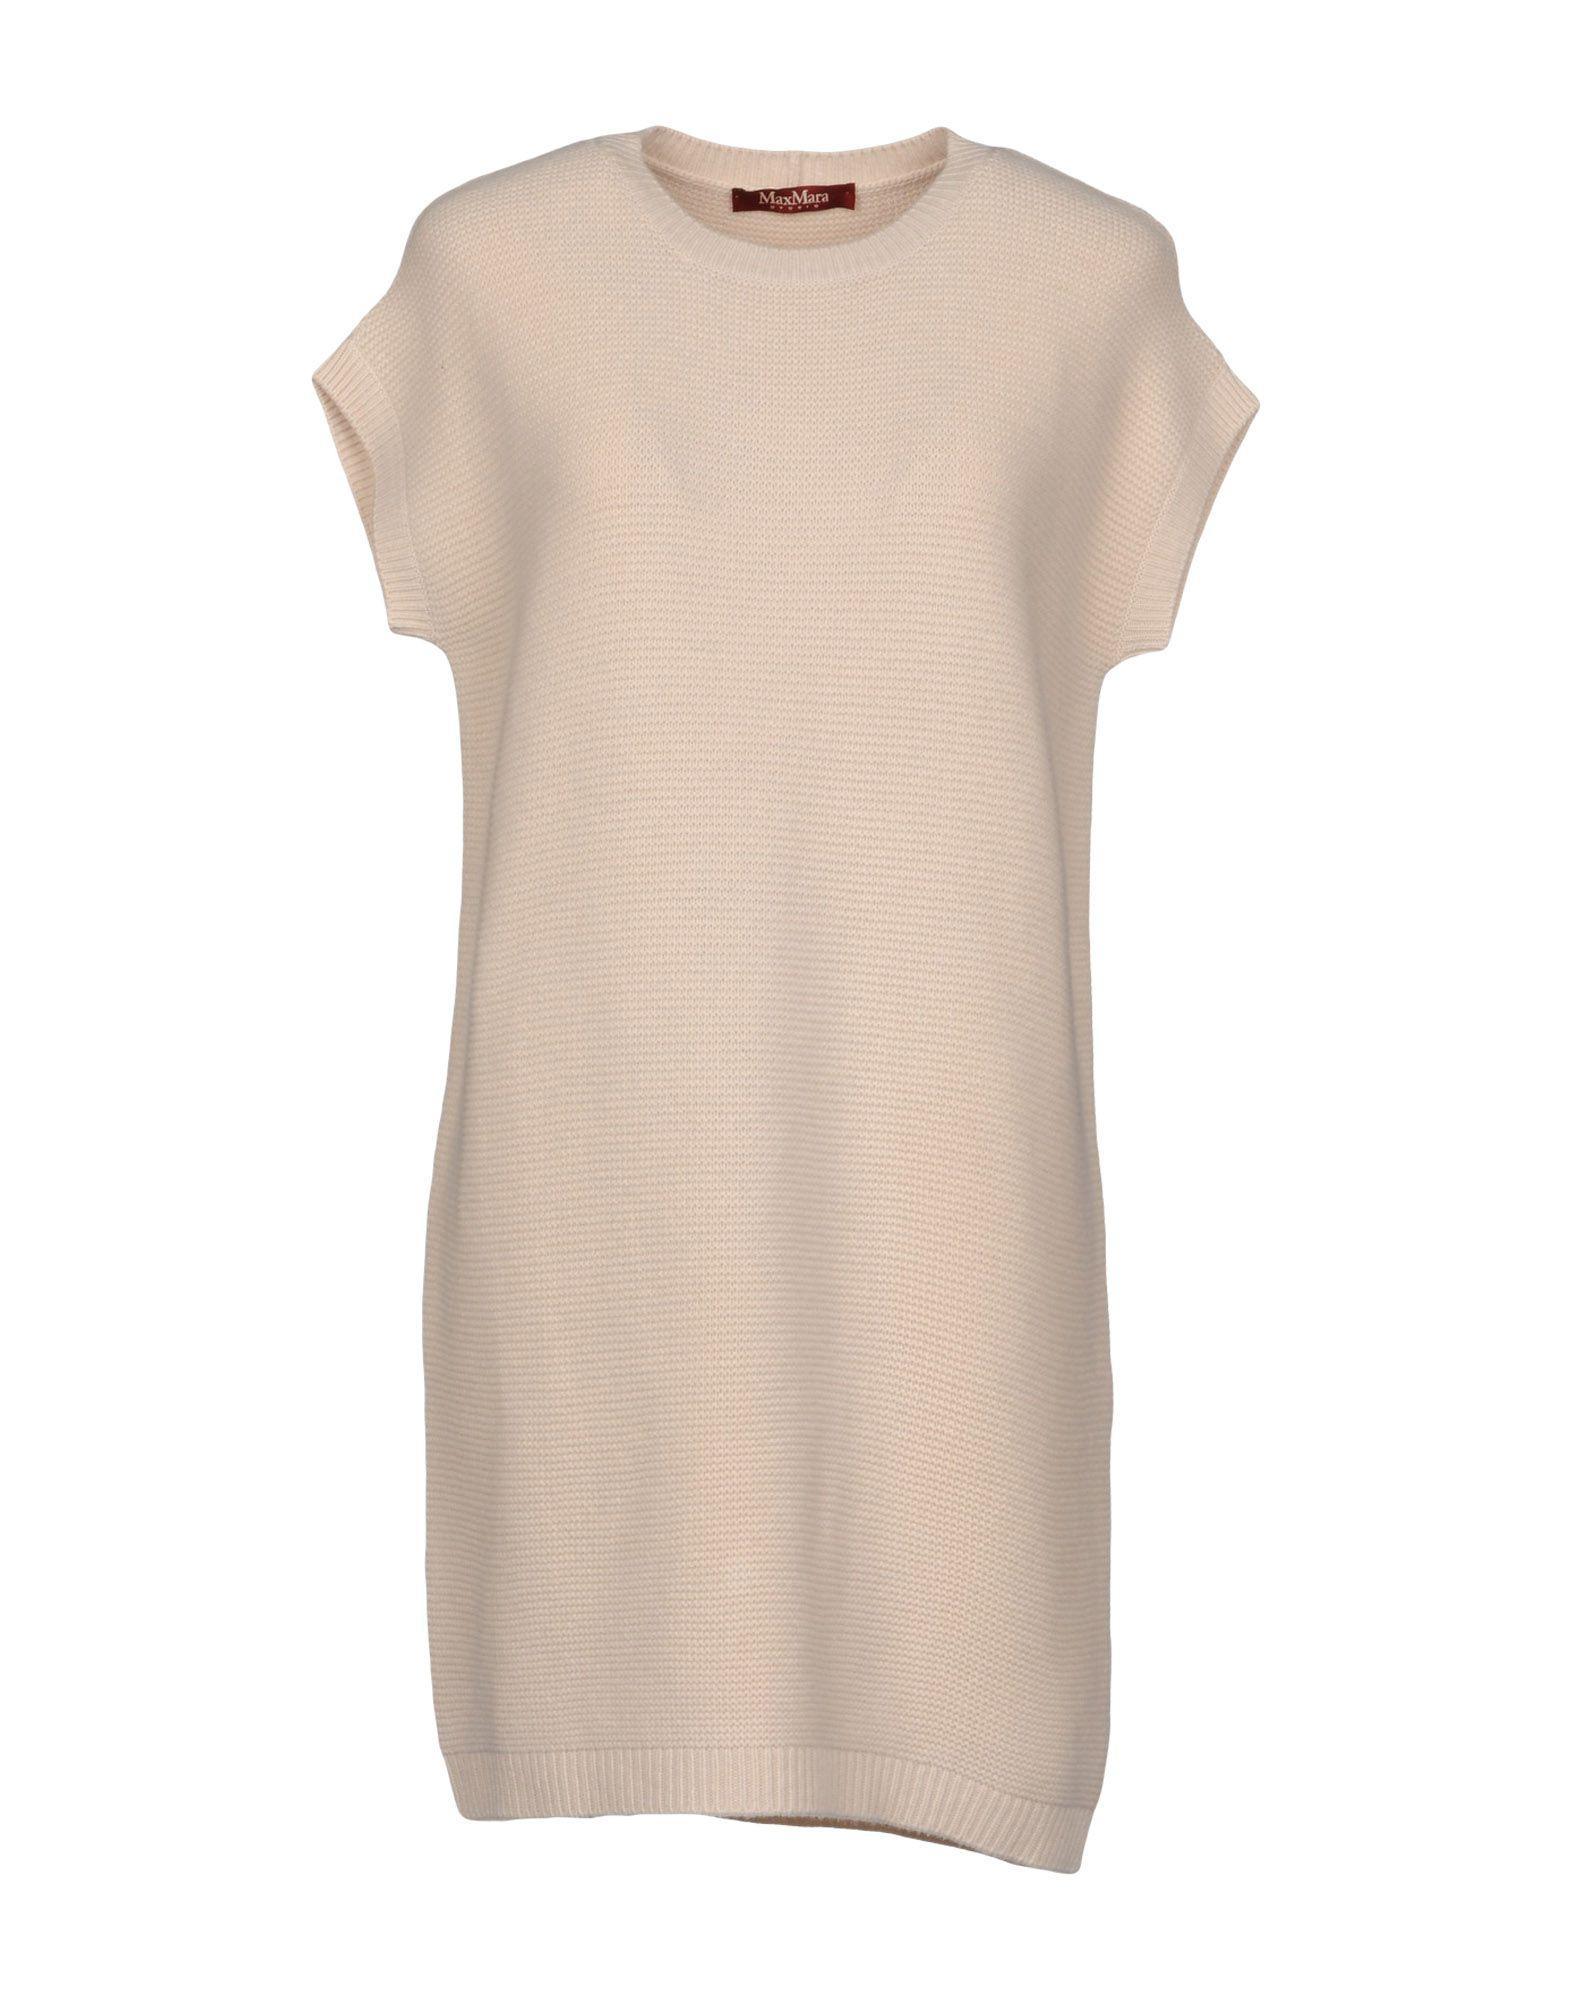 Max Mara Short Dresses In Beige